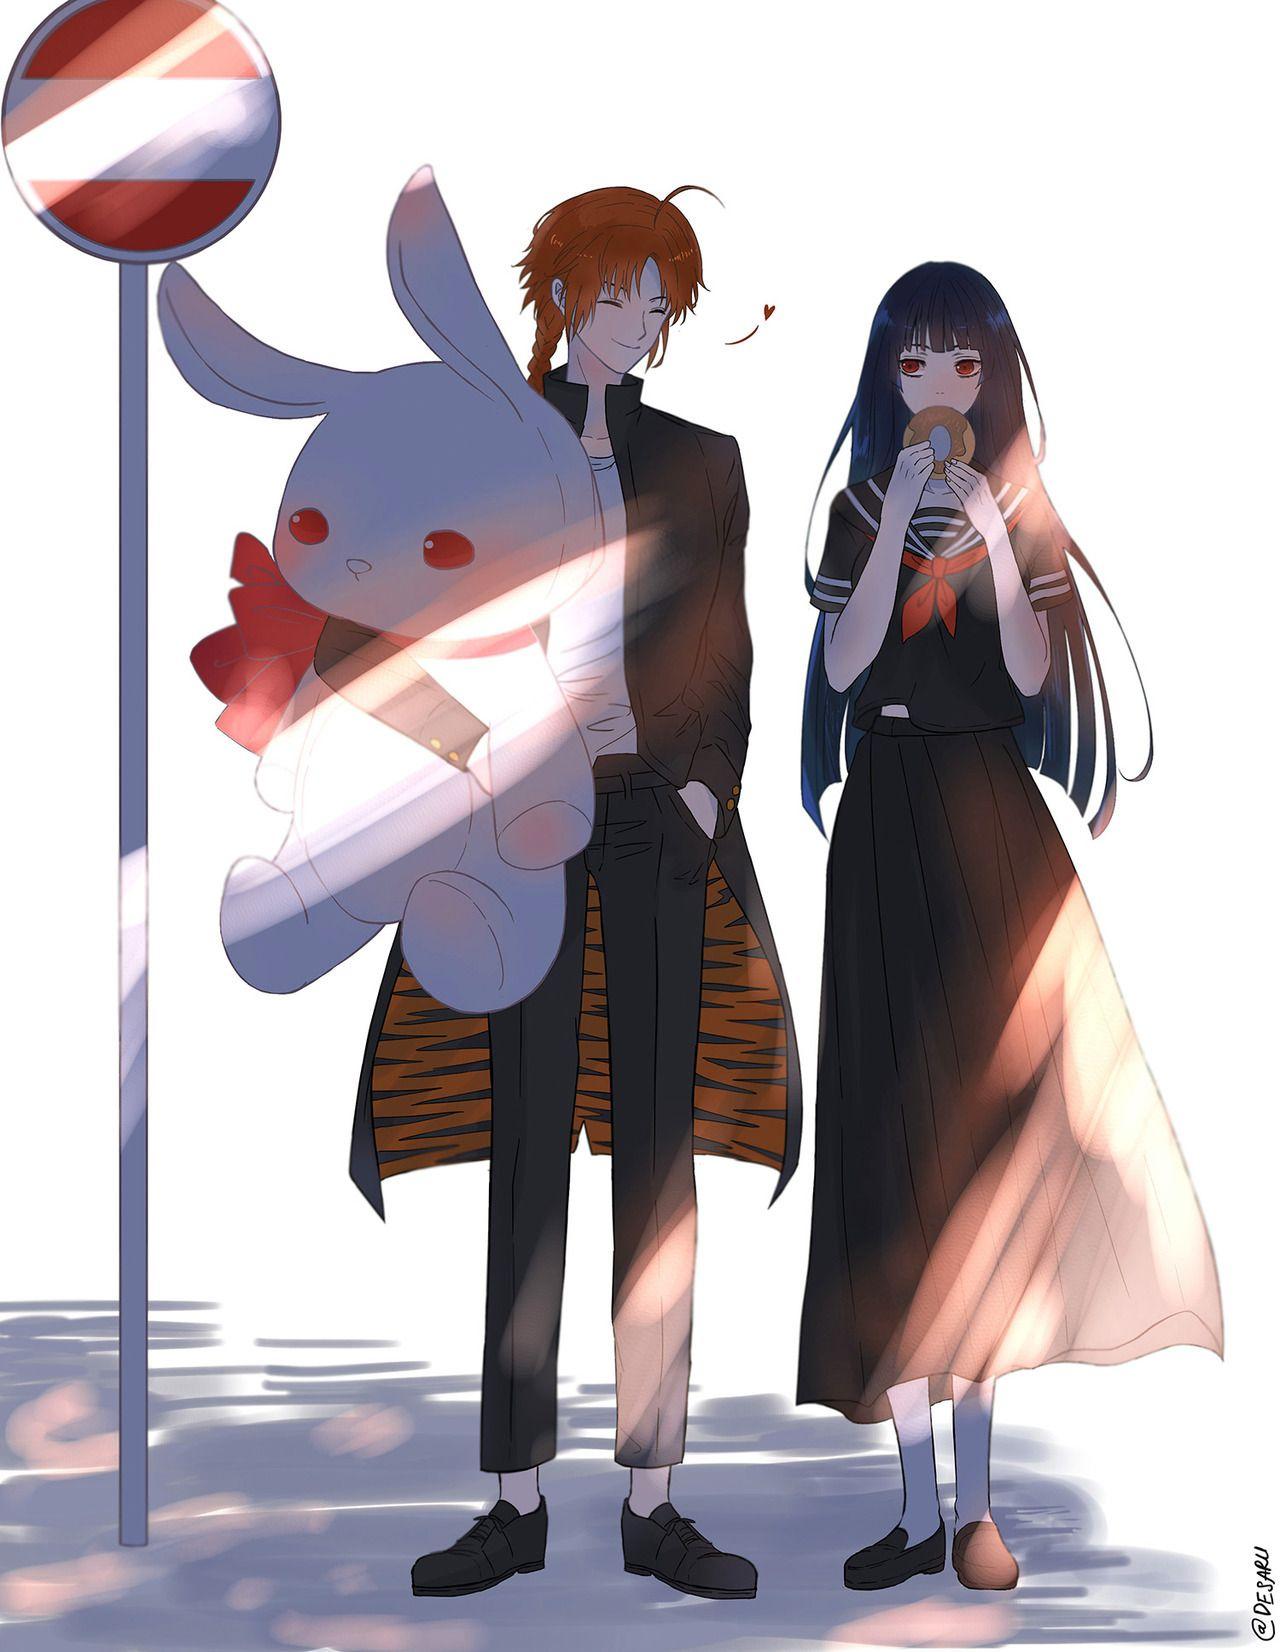 art trade with tan chan blackhaiper xd an au 3z kamunobu fanart 今井信女 銀魂 信女 神楽 イラスト